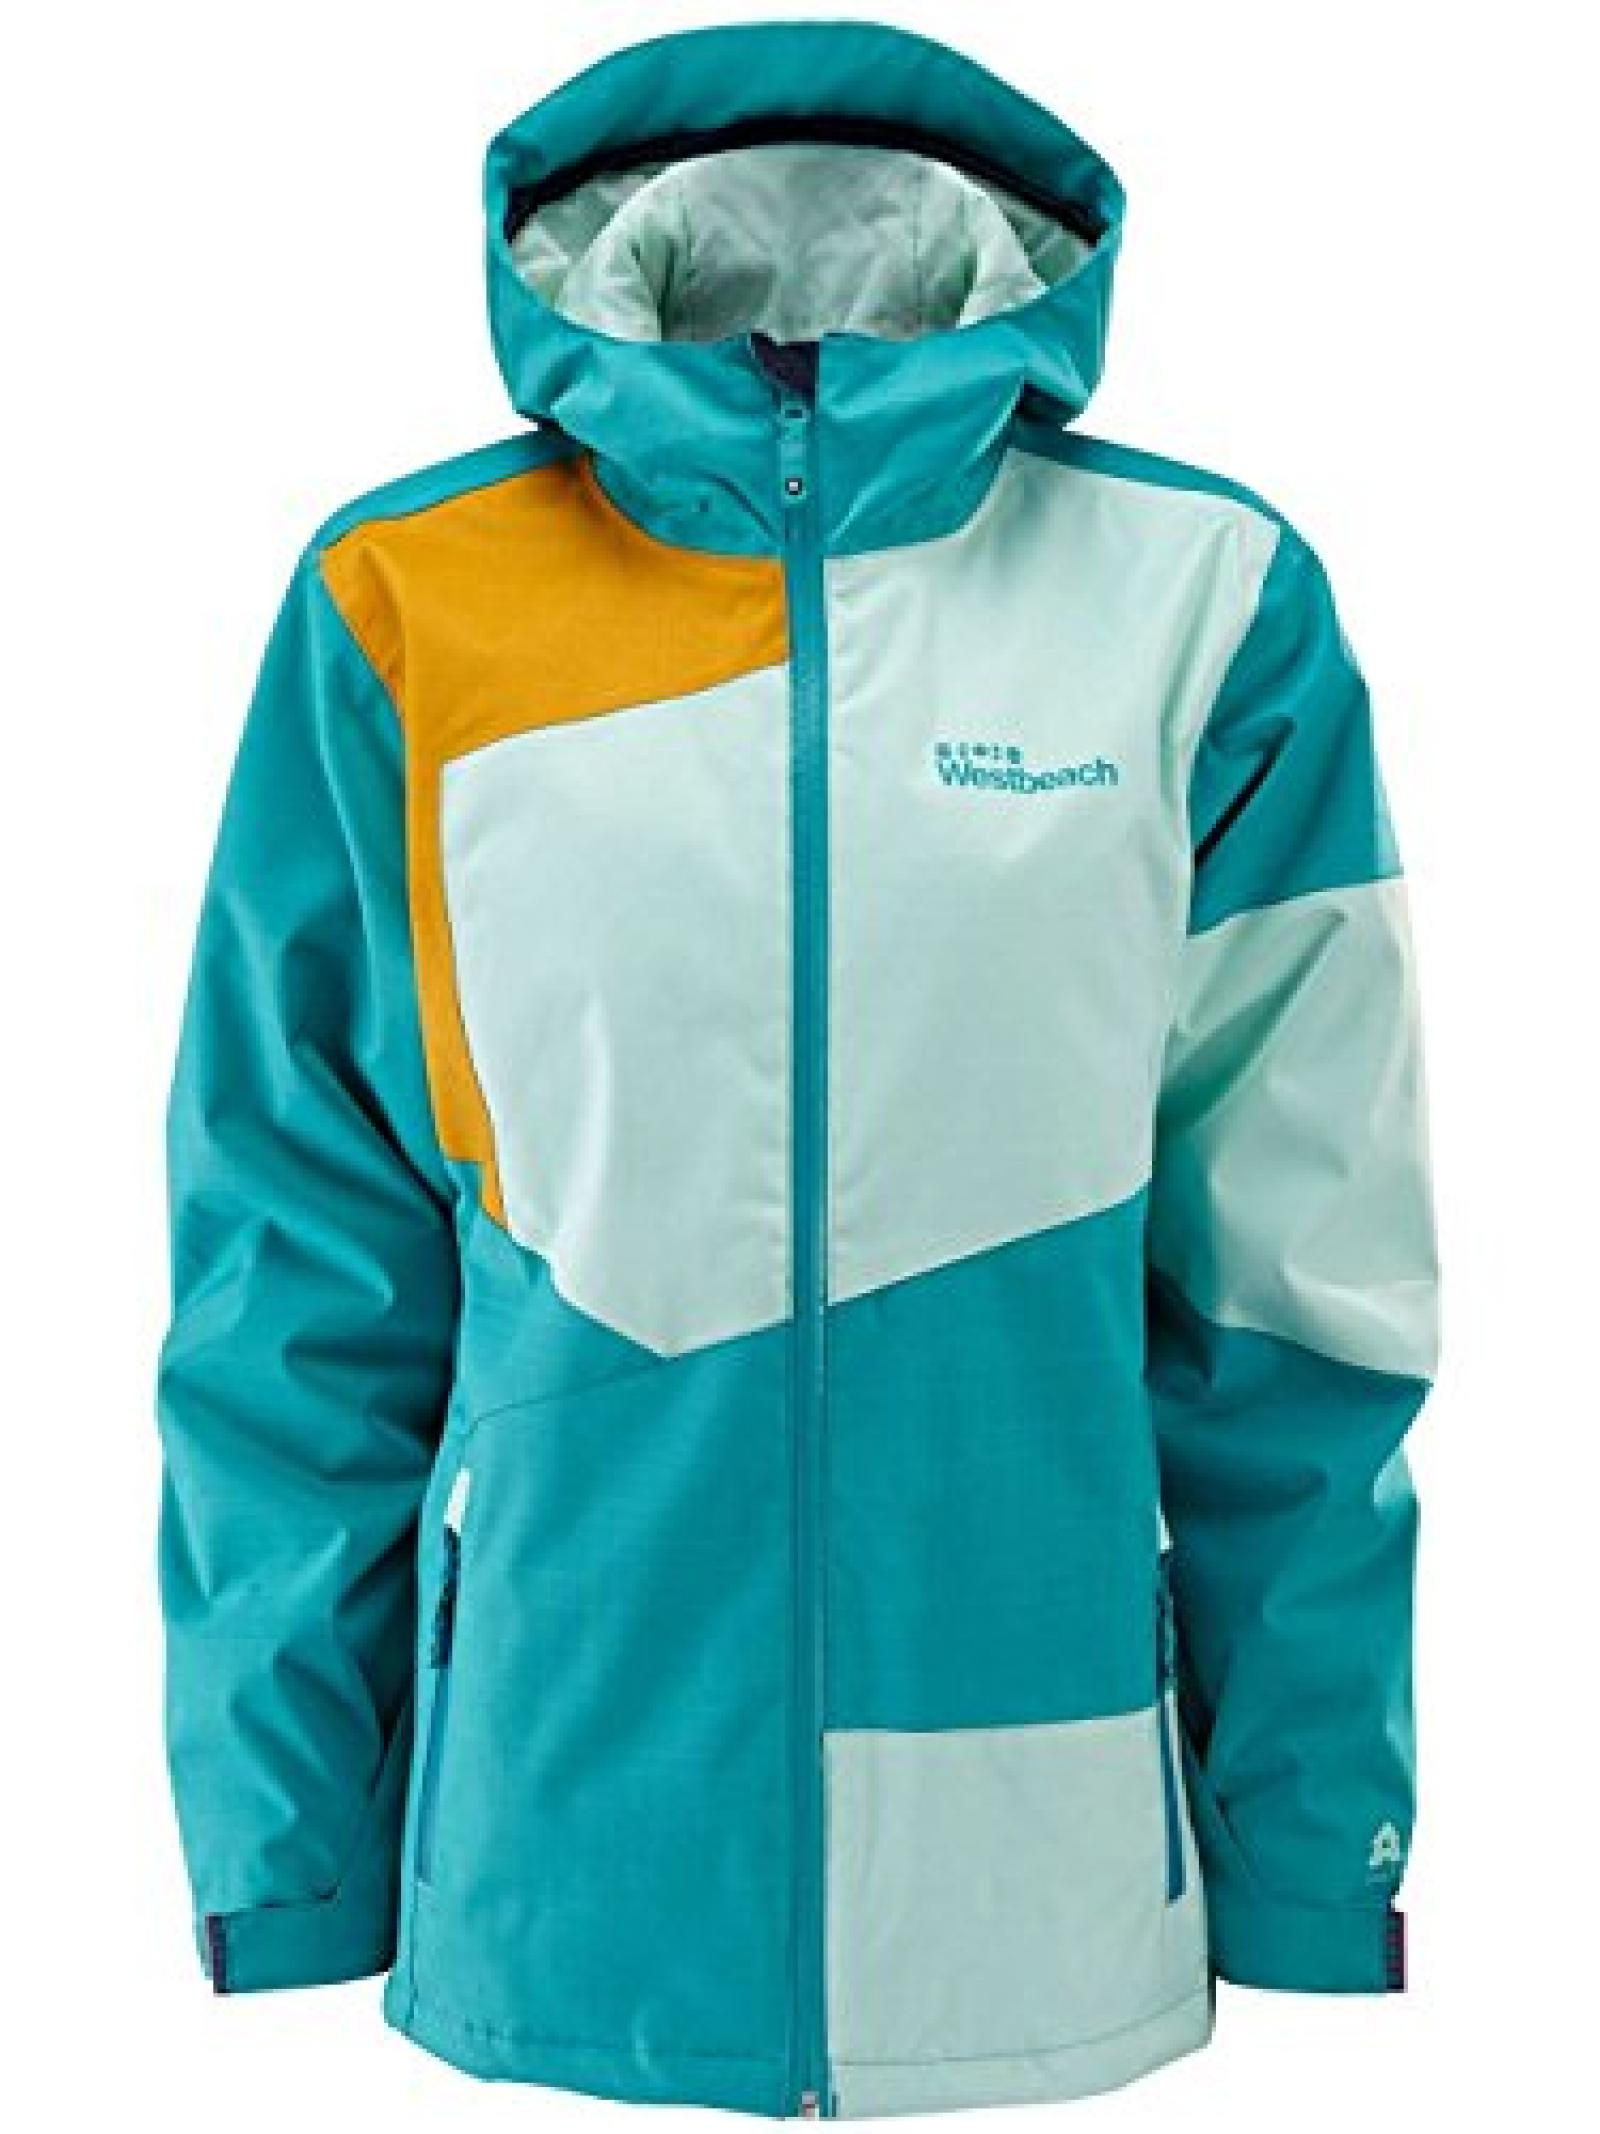 Damen Snowboard Jacke Westbeach Gigawatts Jacket